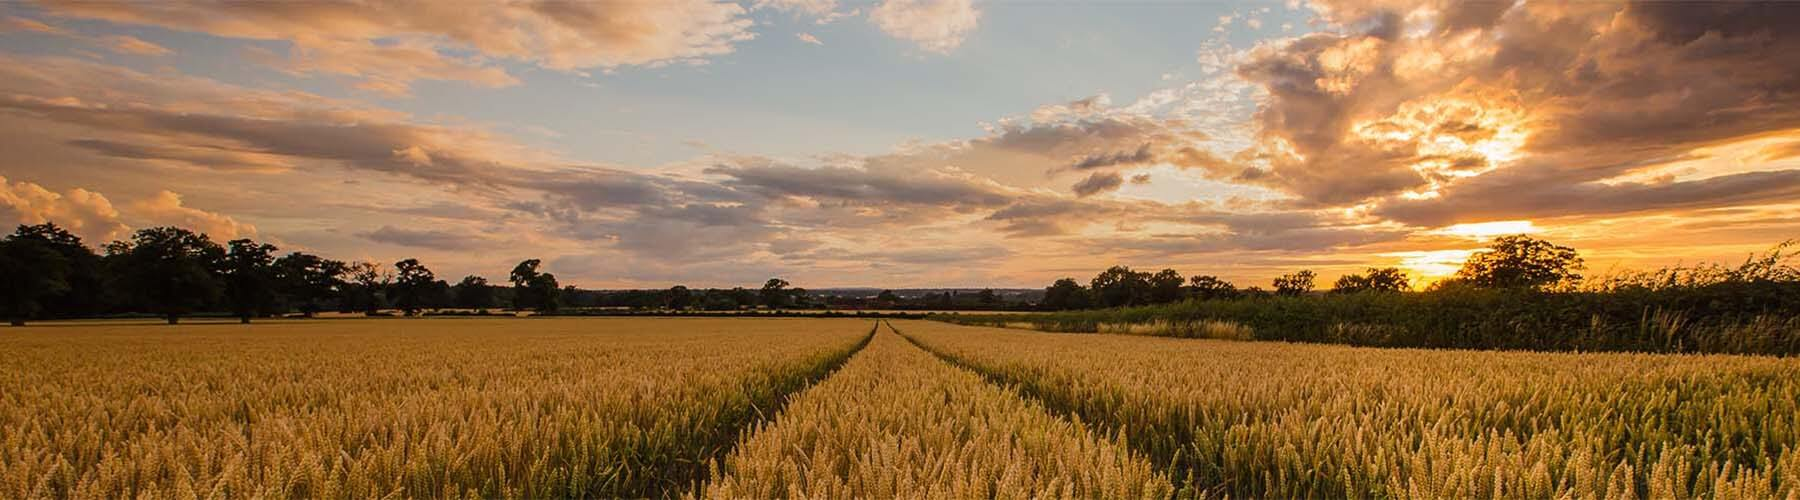 A wheatfield at sunrise.